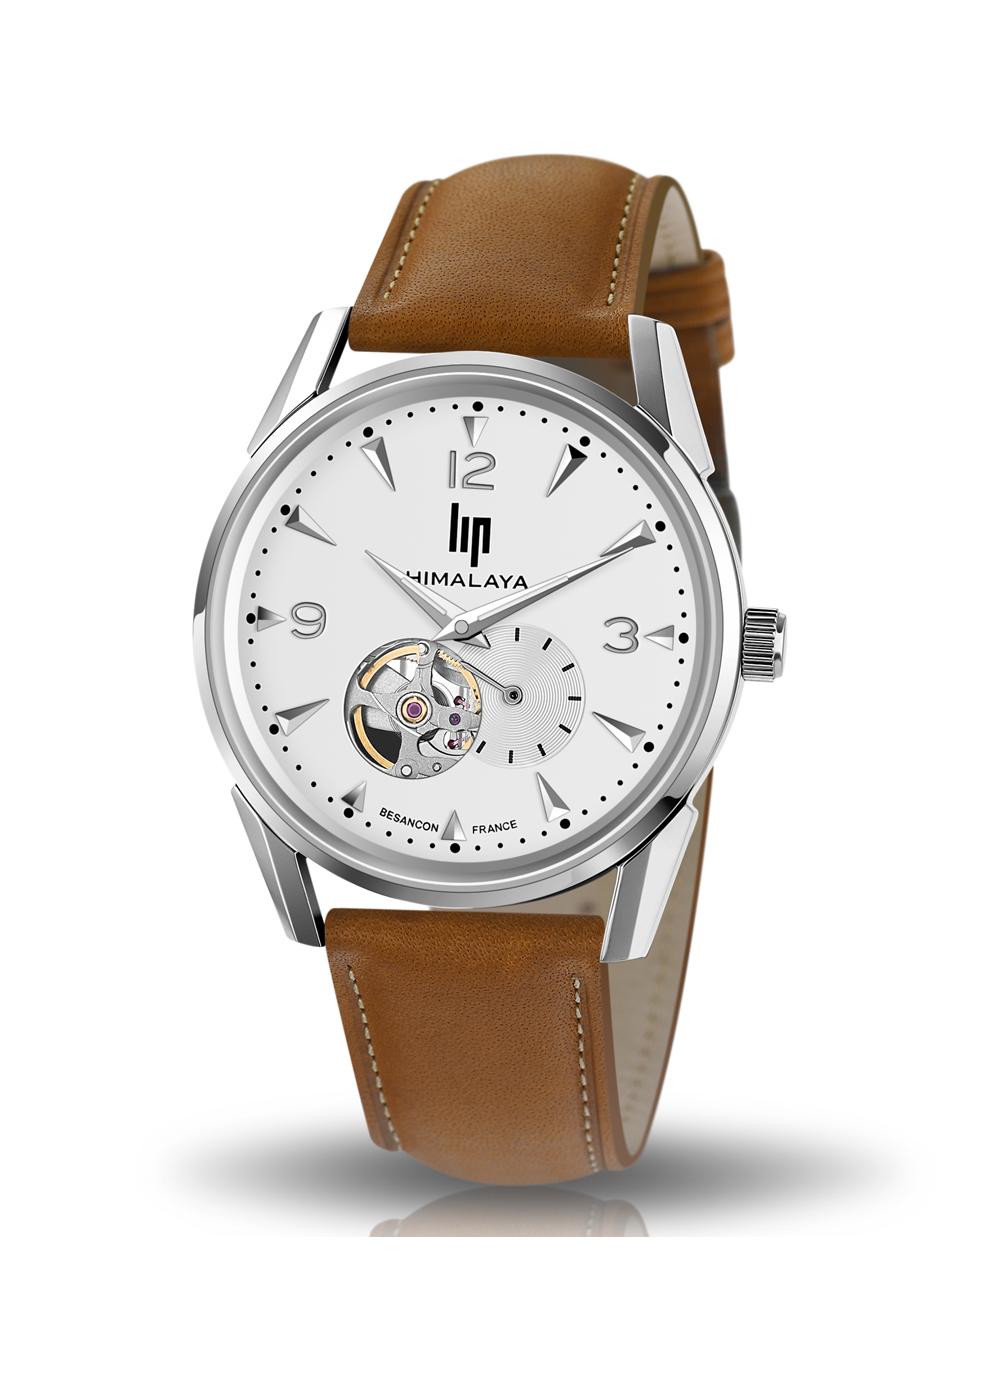 montre Lip, Himalaya 40 mm, cadran blanc, coeur battant, cuir marron, automatique, 671558